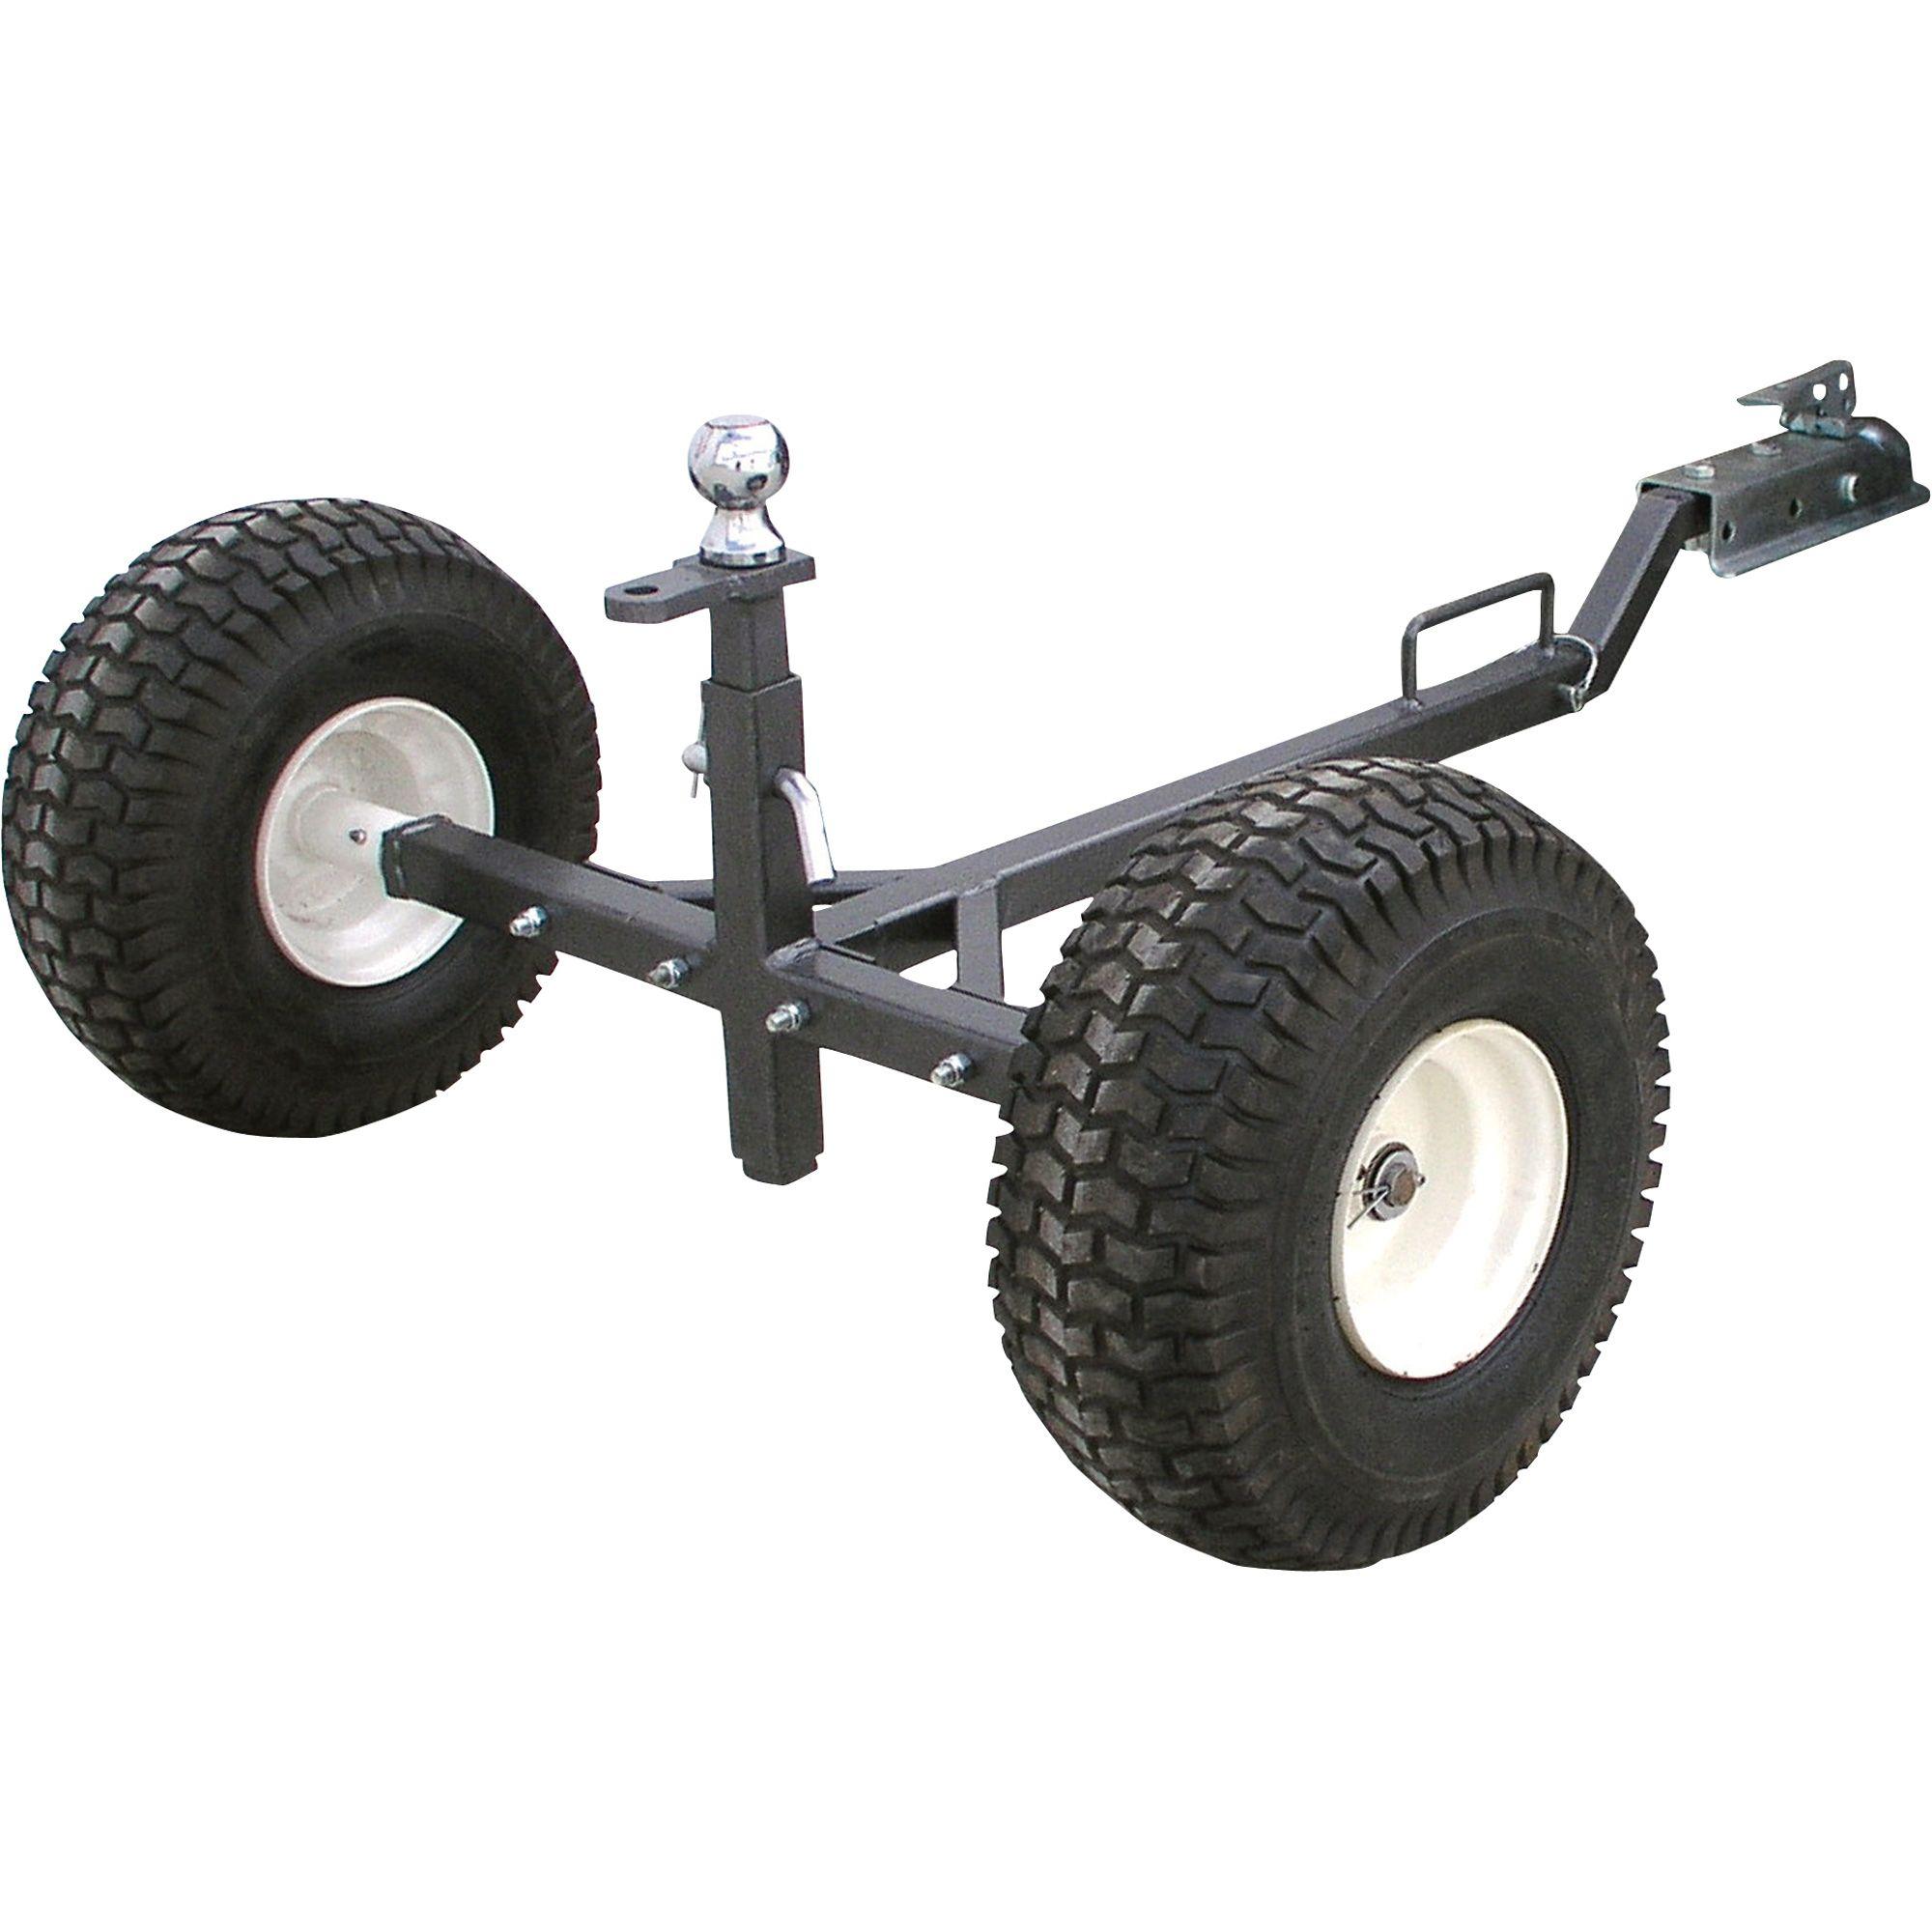 Atv dolly wheels nylon tool pouch